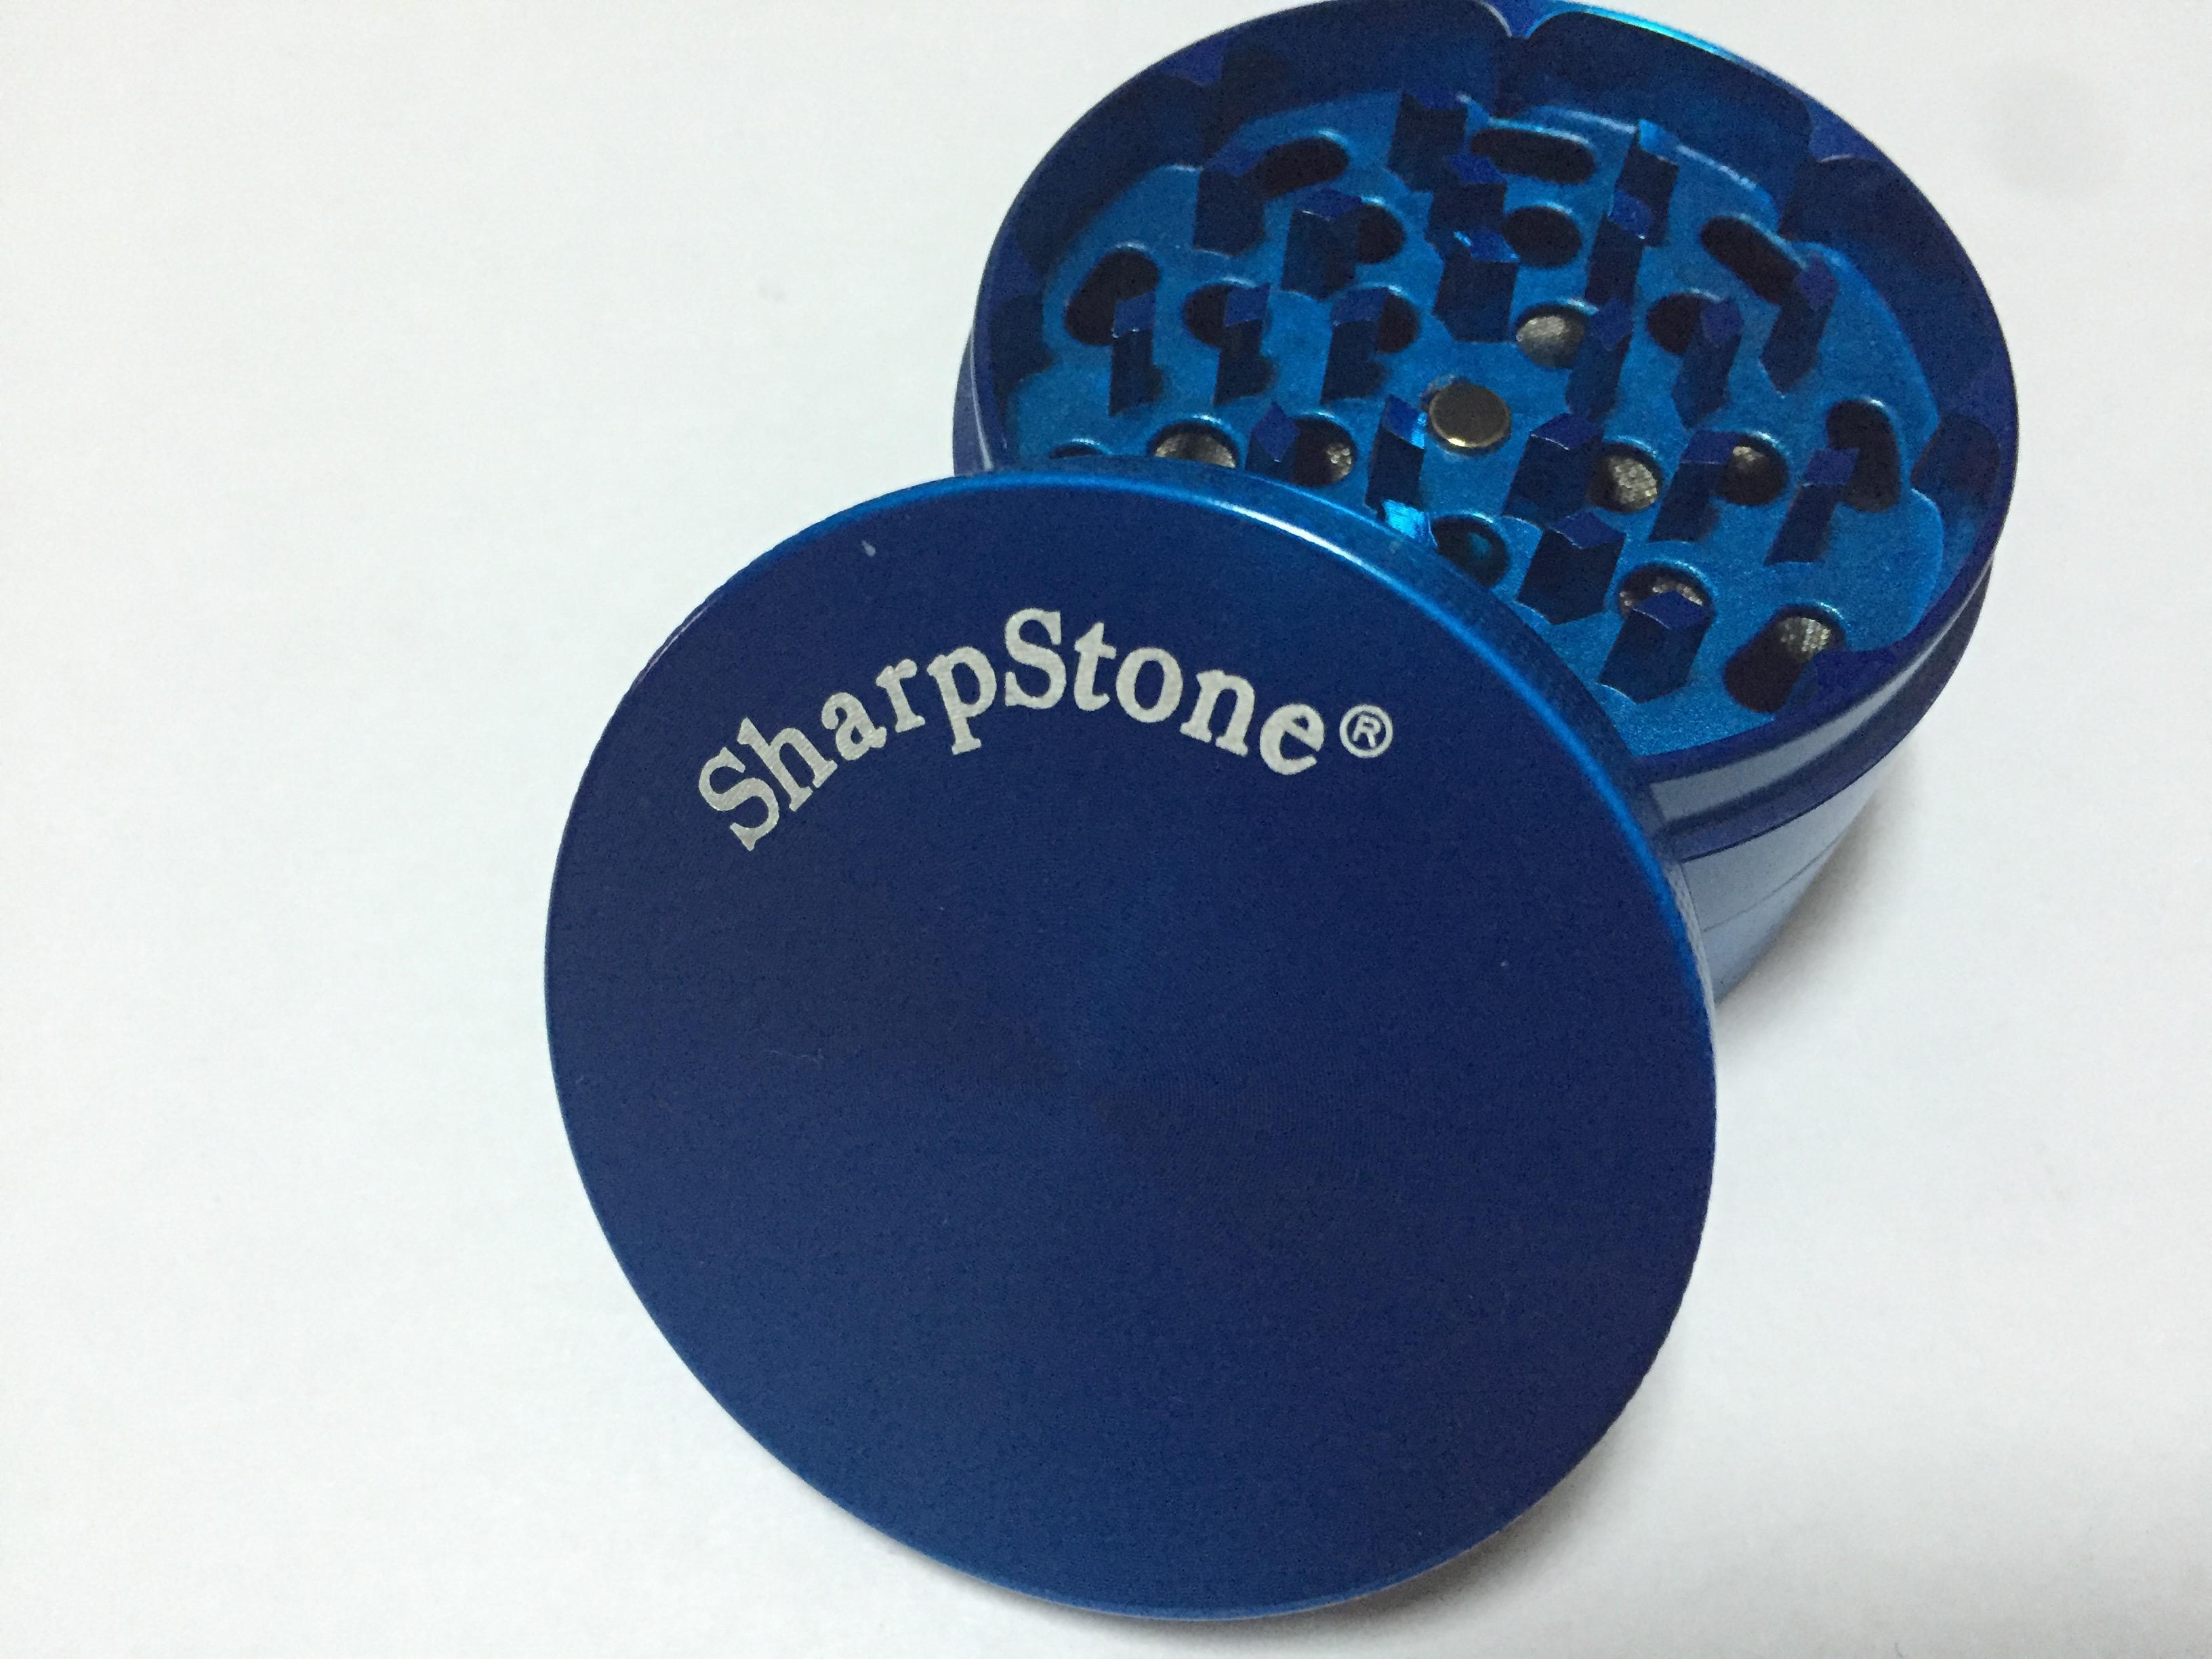 4pc 40mm 63mm Best SharpStone® Herb metal gred Stone Sharp Stone Hard توب التبغ مطاحن دخان الأعشاب